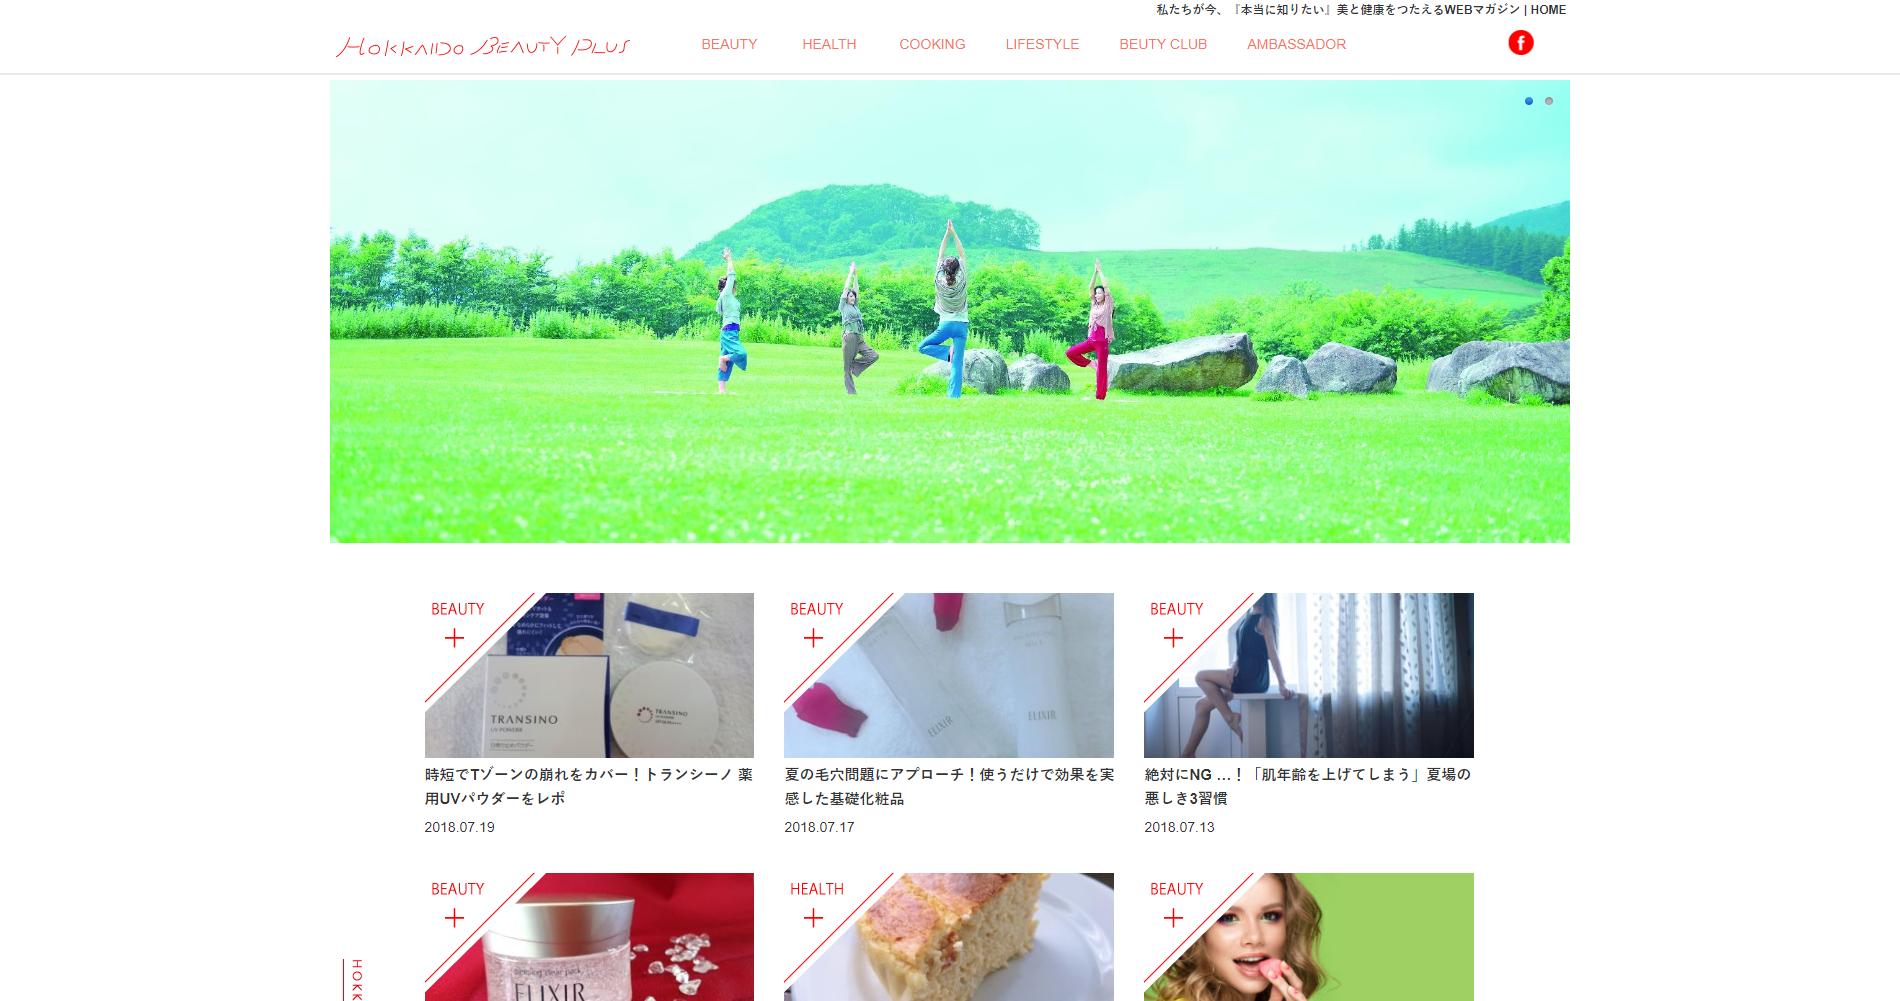 FireShot Capture 826 - 私たちが今、『本当に知りたい』美と健康をつたえるWEBマガジン - https___hokkaidobeauty.jp_